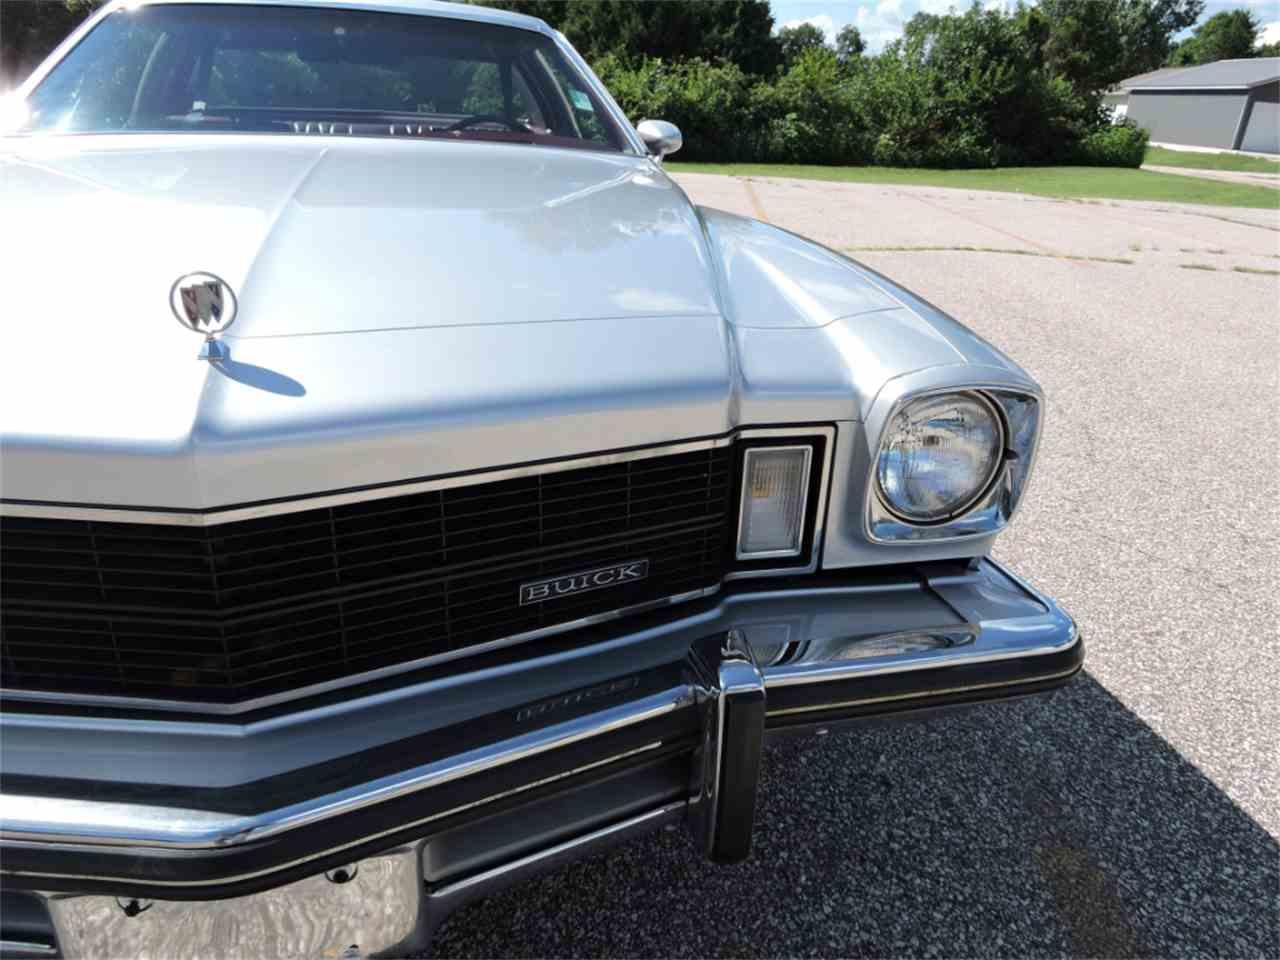 1975 Buick Century For Sale Classiccars Com Cc 1000865